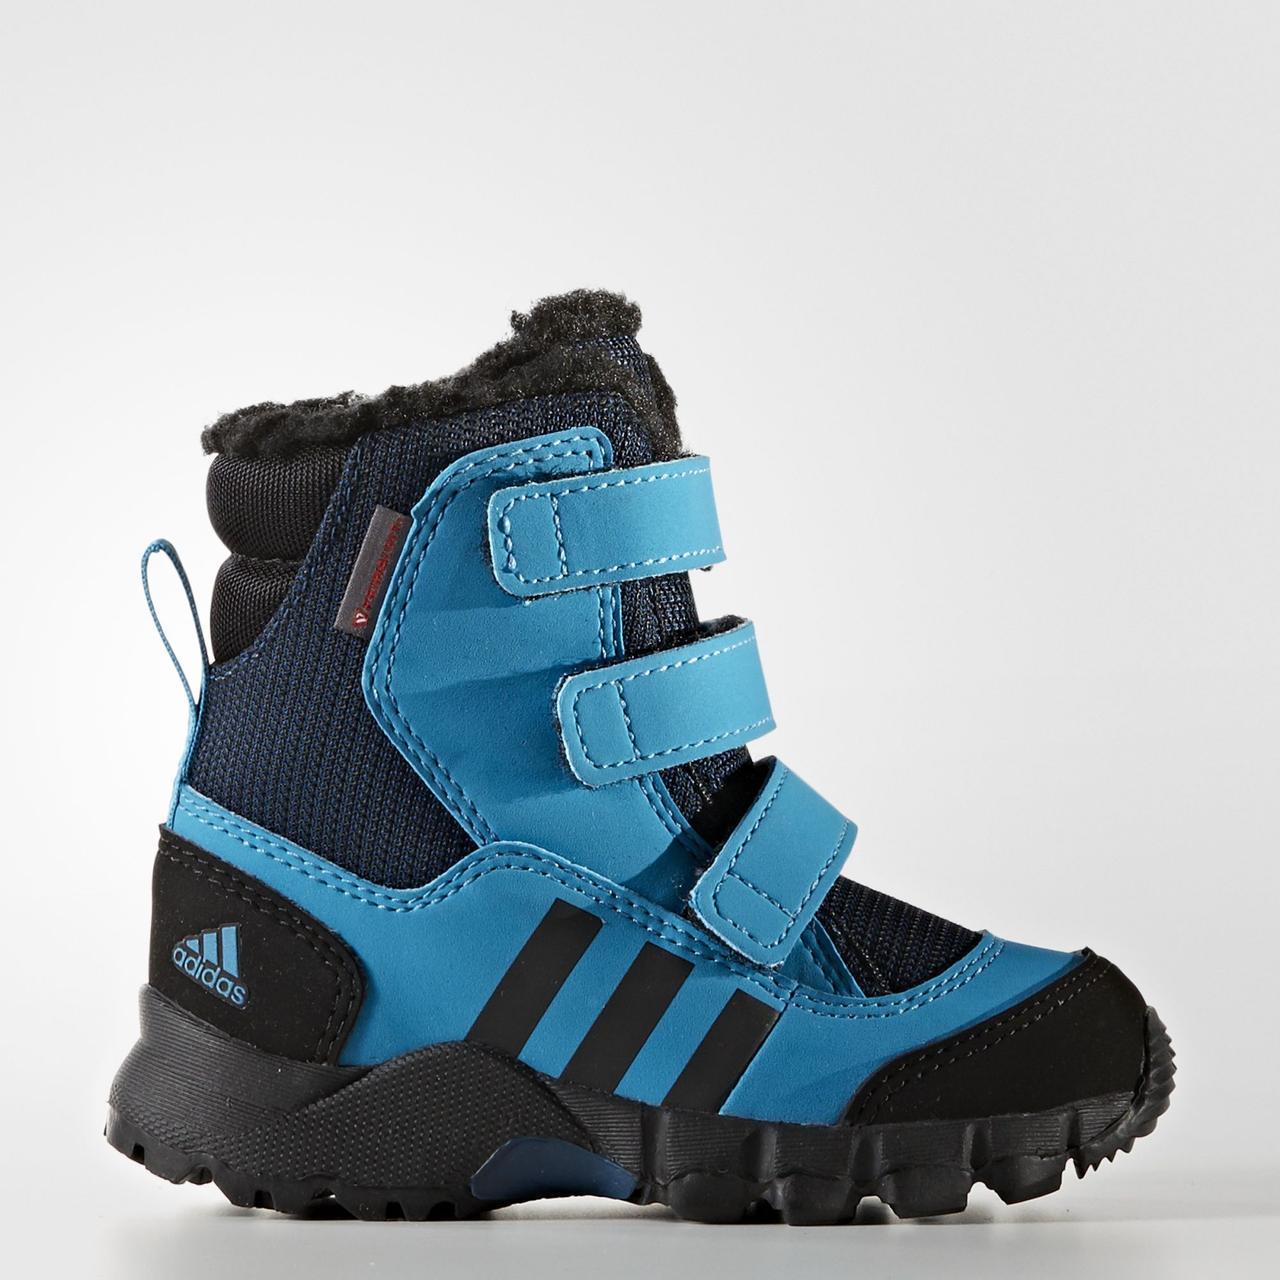 b249dc3aa Детские ботинки Adidas Performance Climawarm Holtanna (Артикул: CQ2466) -  Интернет-магазин «